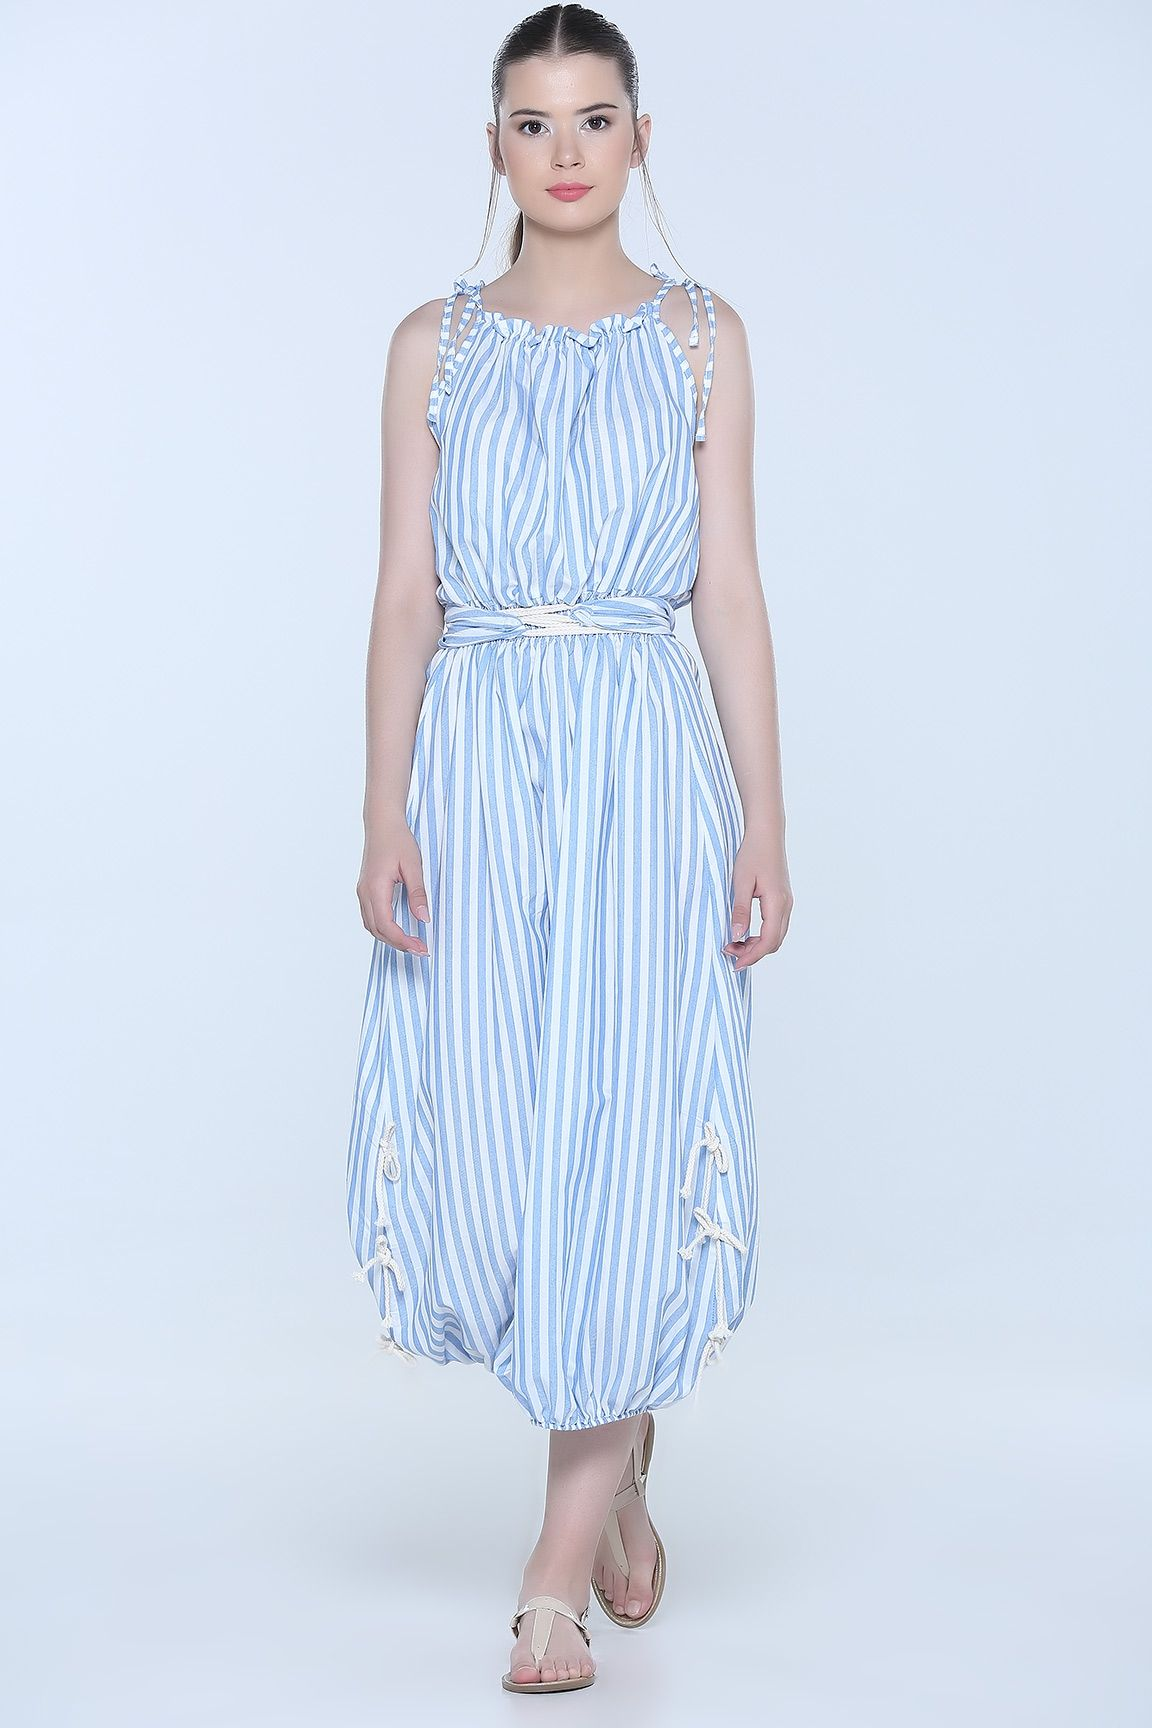 2509ad3088469 Mavi ÇİZGİLİ BEL BÜZGÜLÜ ELBİSE | Elbise Modelleri | Dresses, Summer ...